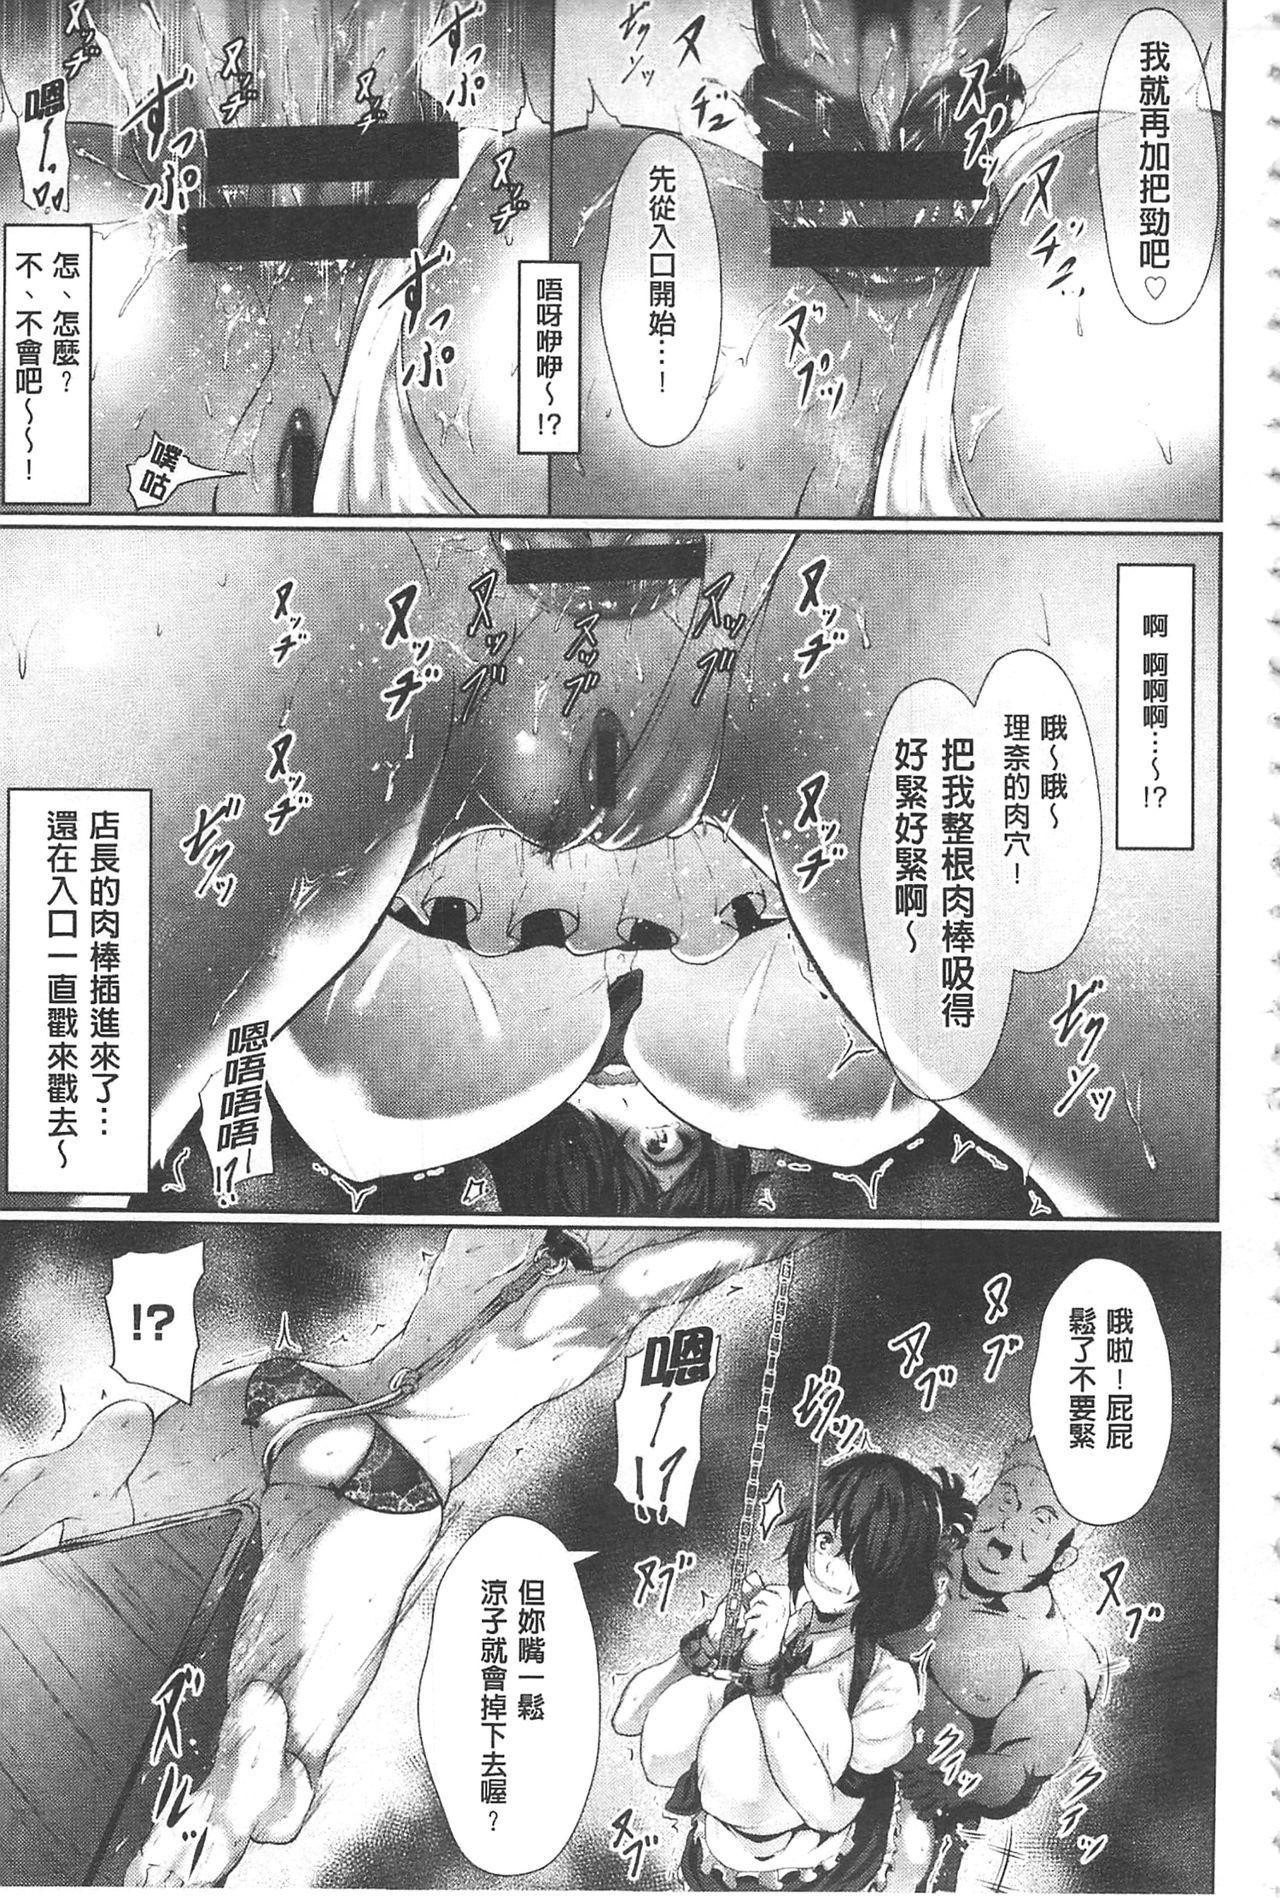 [Lorica] Biinkan Anal ~Kakusei Nejikomi Ana~ | 美淫感猥菊花 塞入擴張覺醒穴 [Chinese] 19